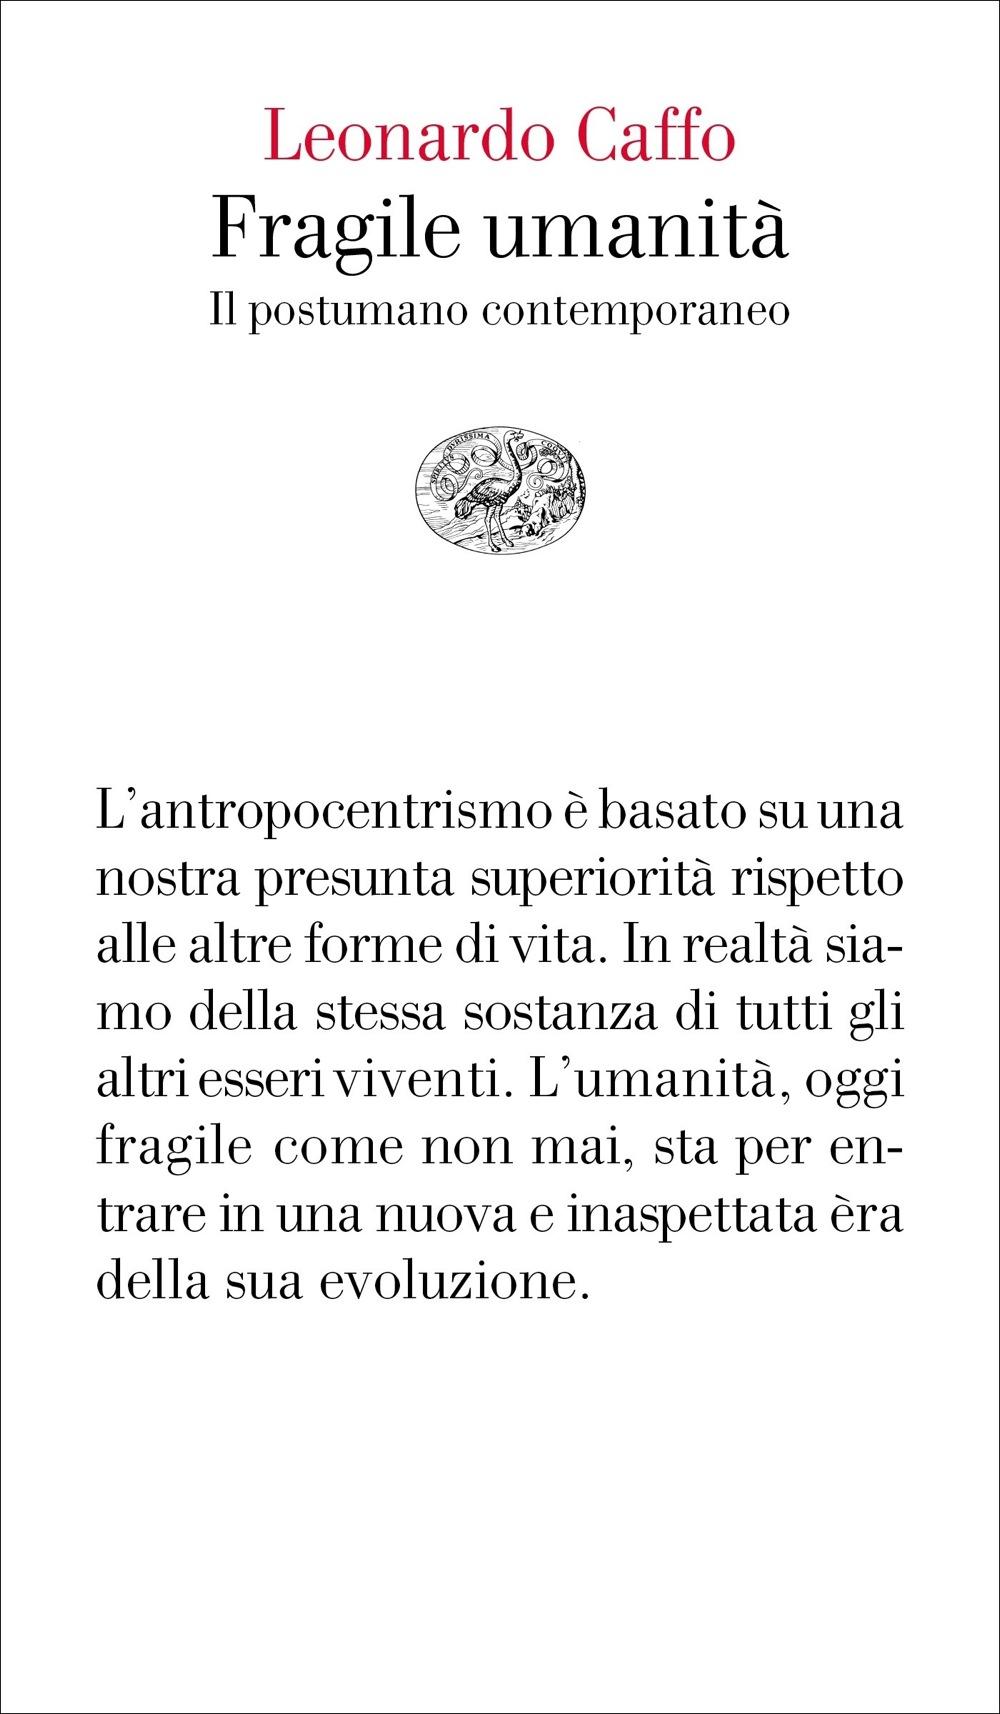 Fragile Umanità Leonardo Caffo Giulio Einaudi Editore Vele